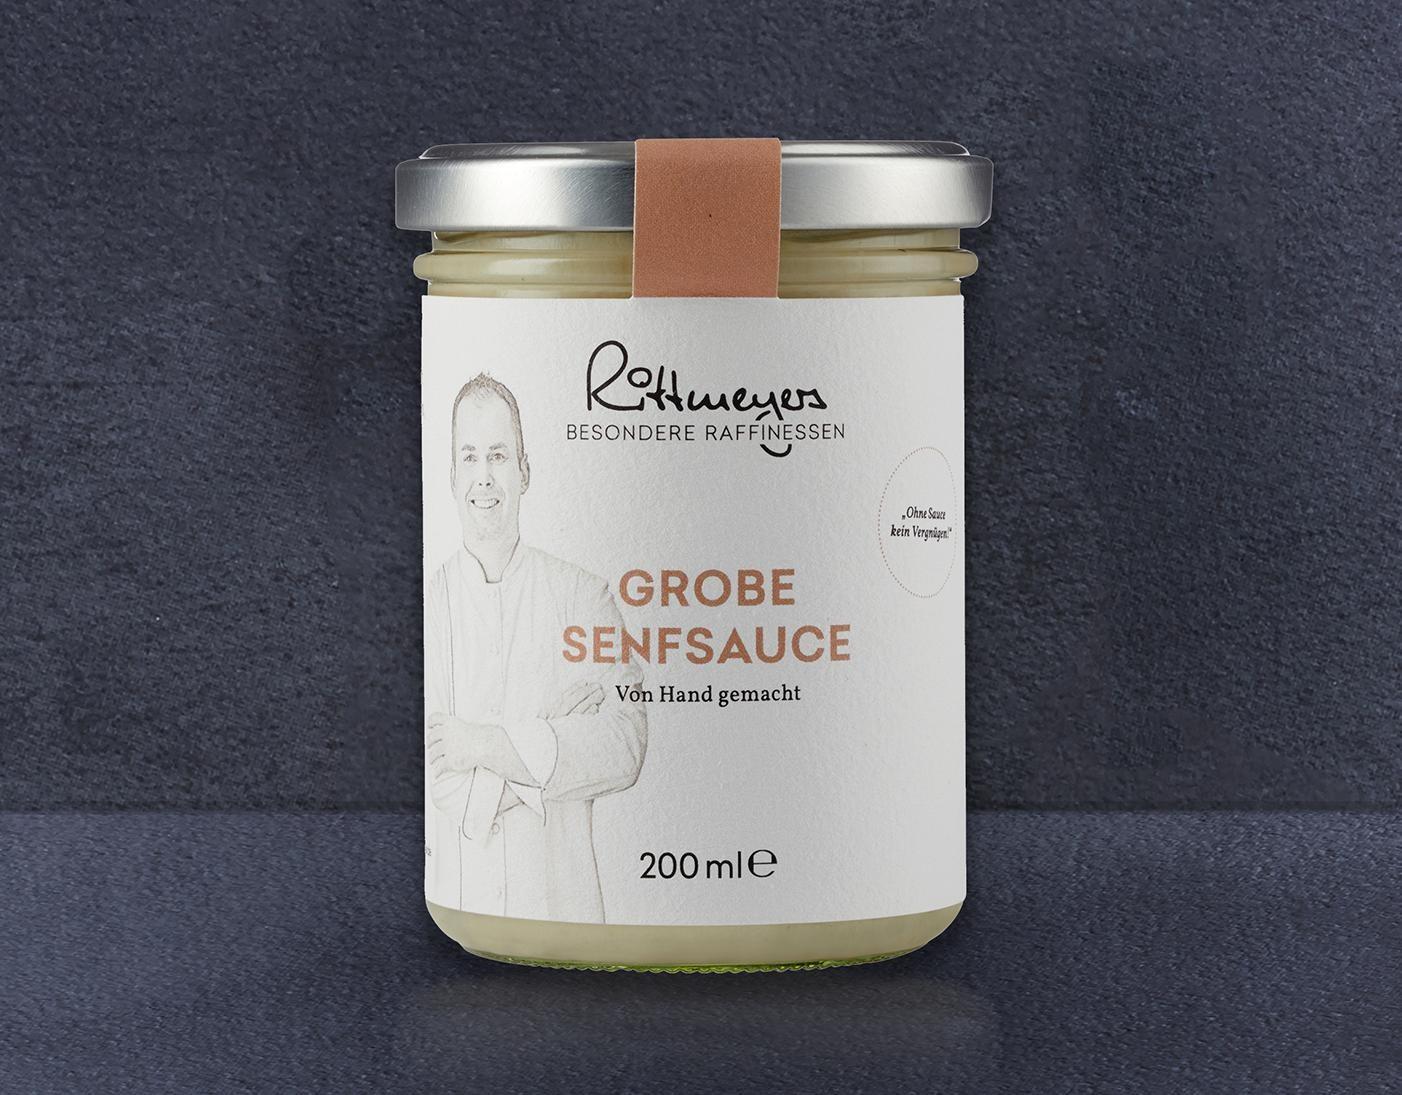 Jens Rittmeyer »Grobe Senfsauce« jetzt kaufen!